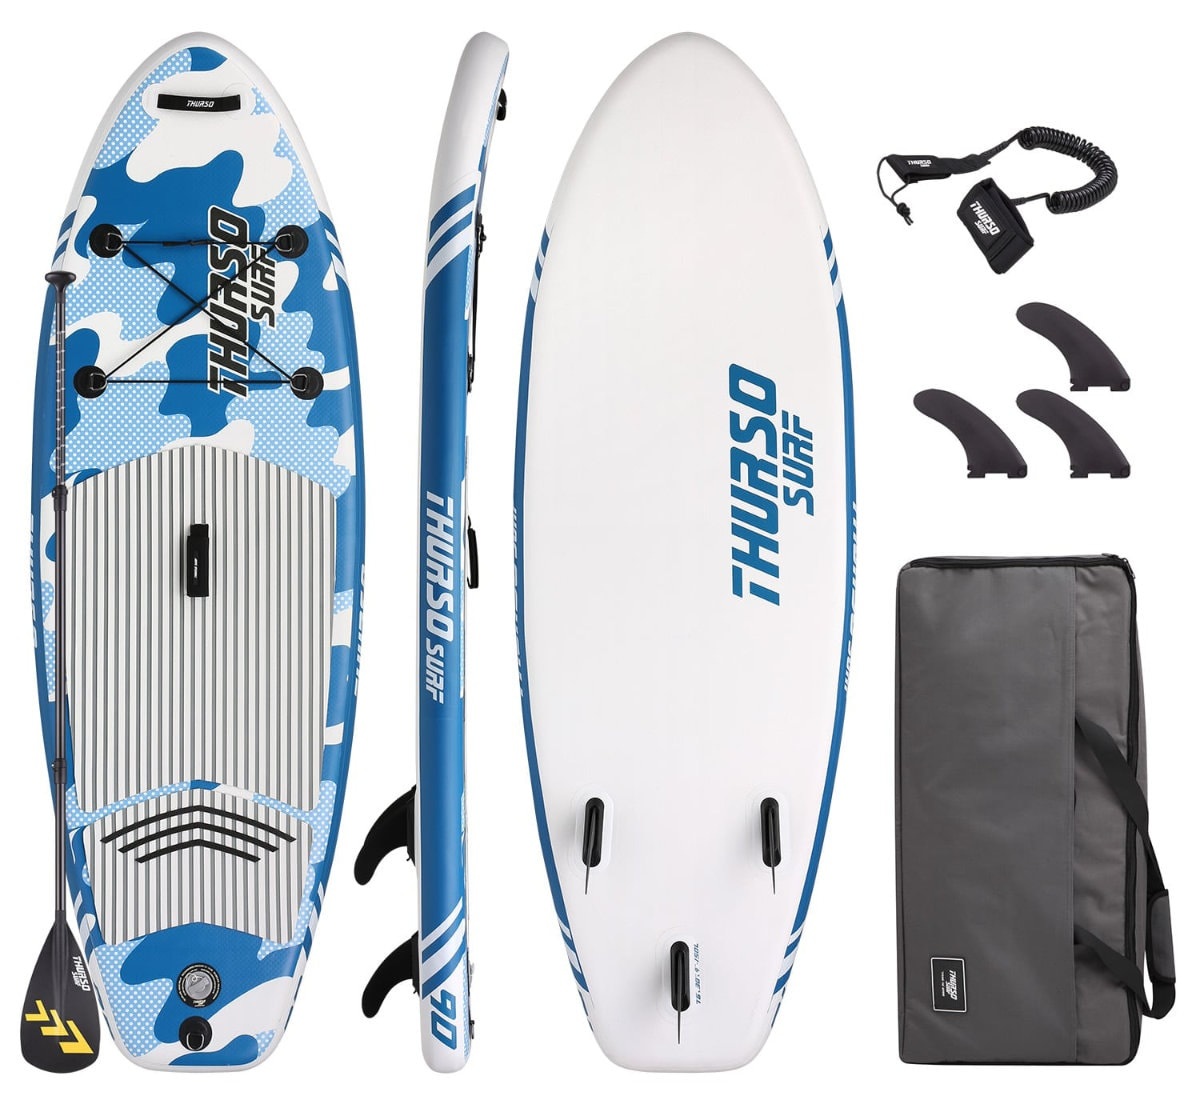 THURSO SURF Prodigy Child Paddle Board